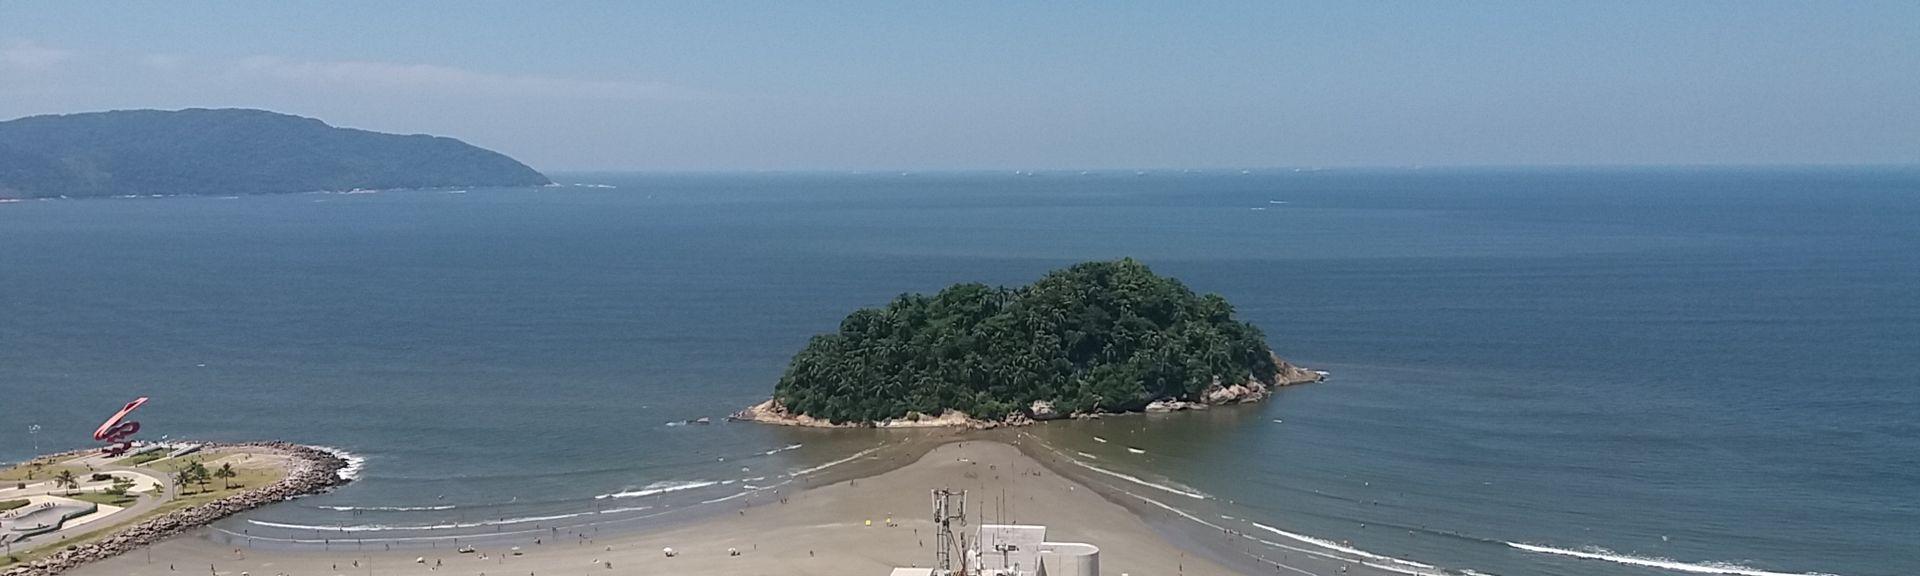 Praia da Enseada, Guaruja, San Paolo, BR